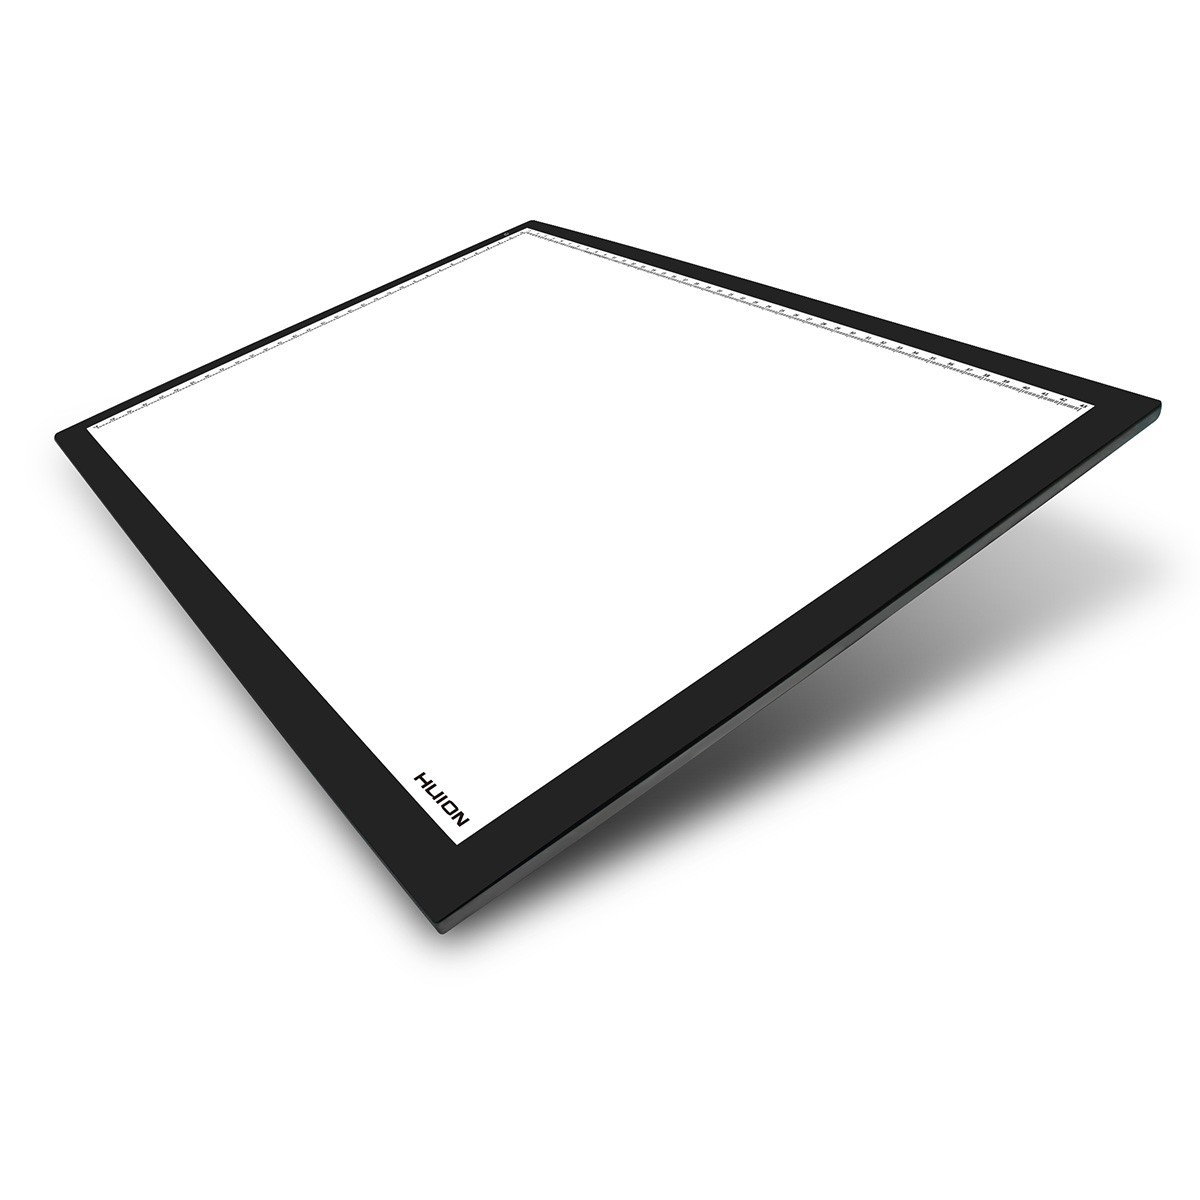 Huion - A3 LED Light Pad image